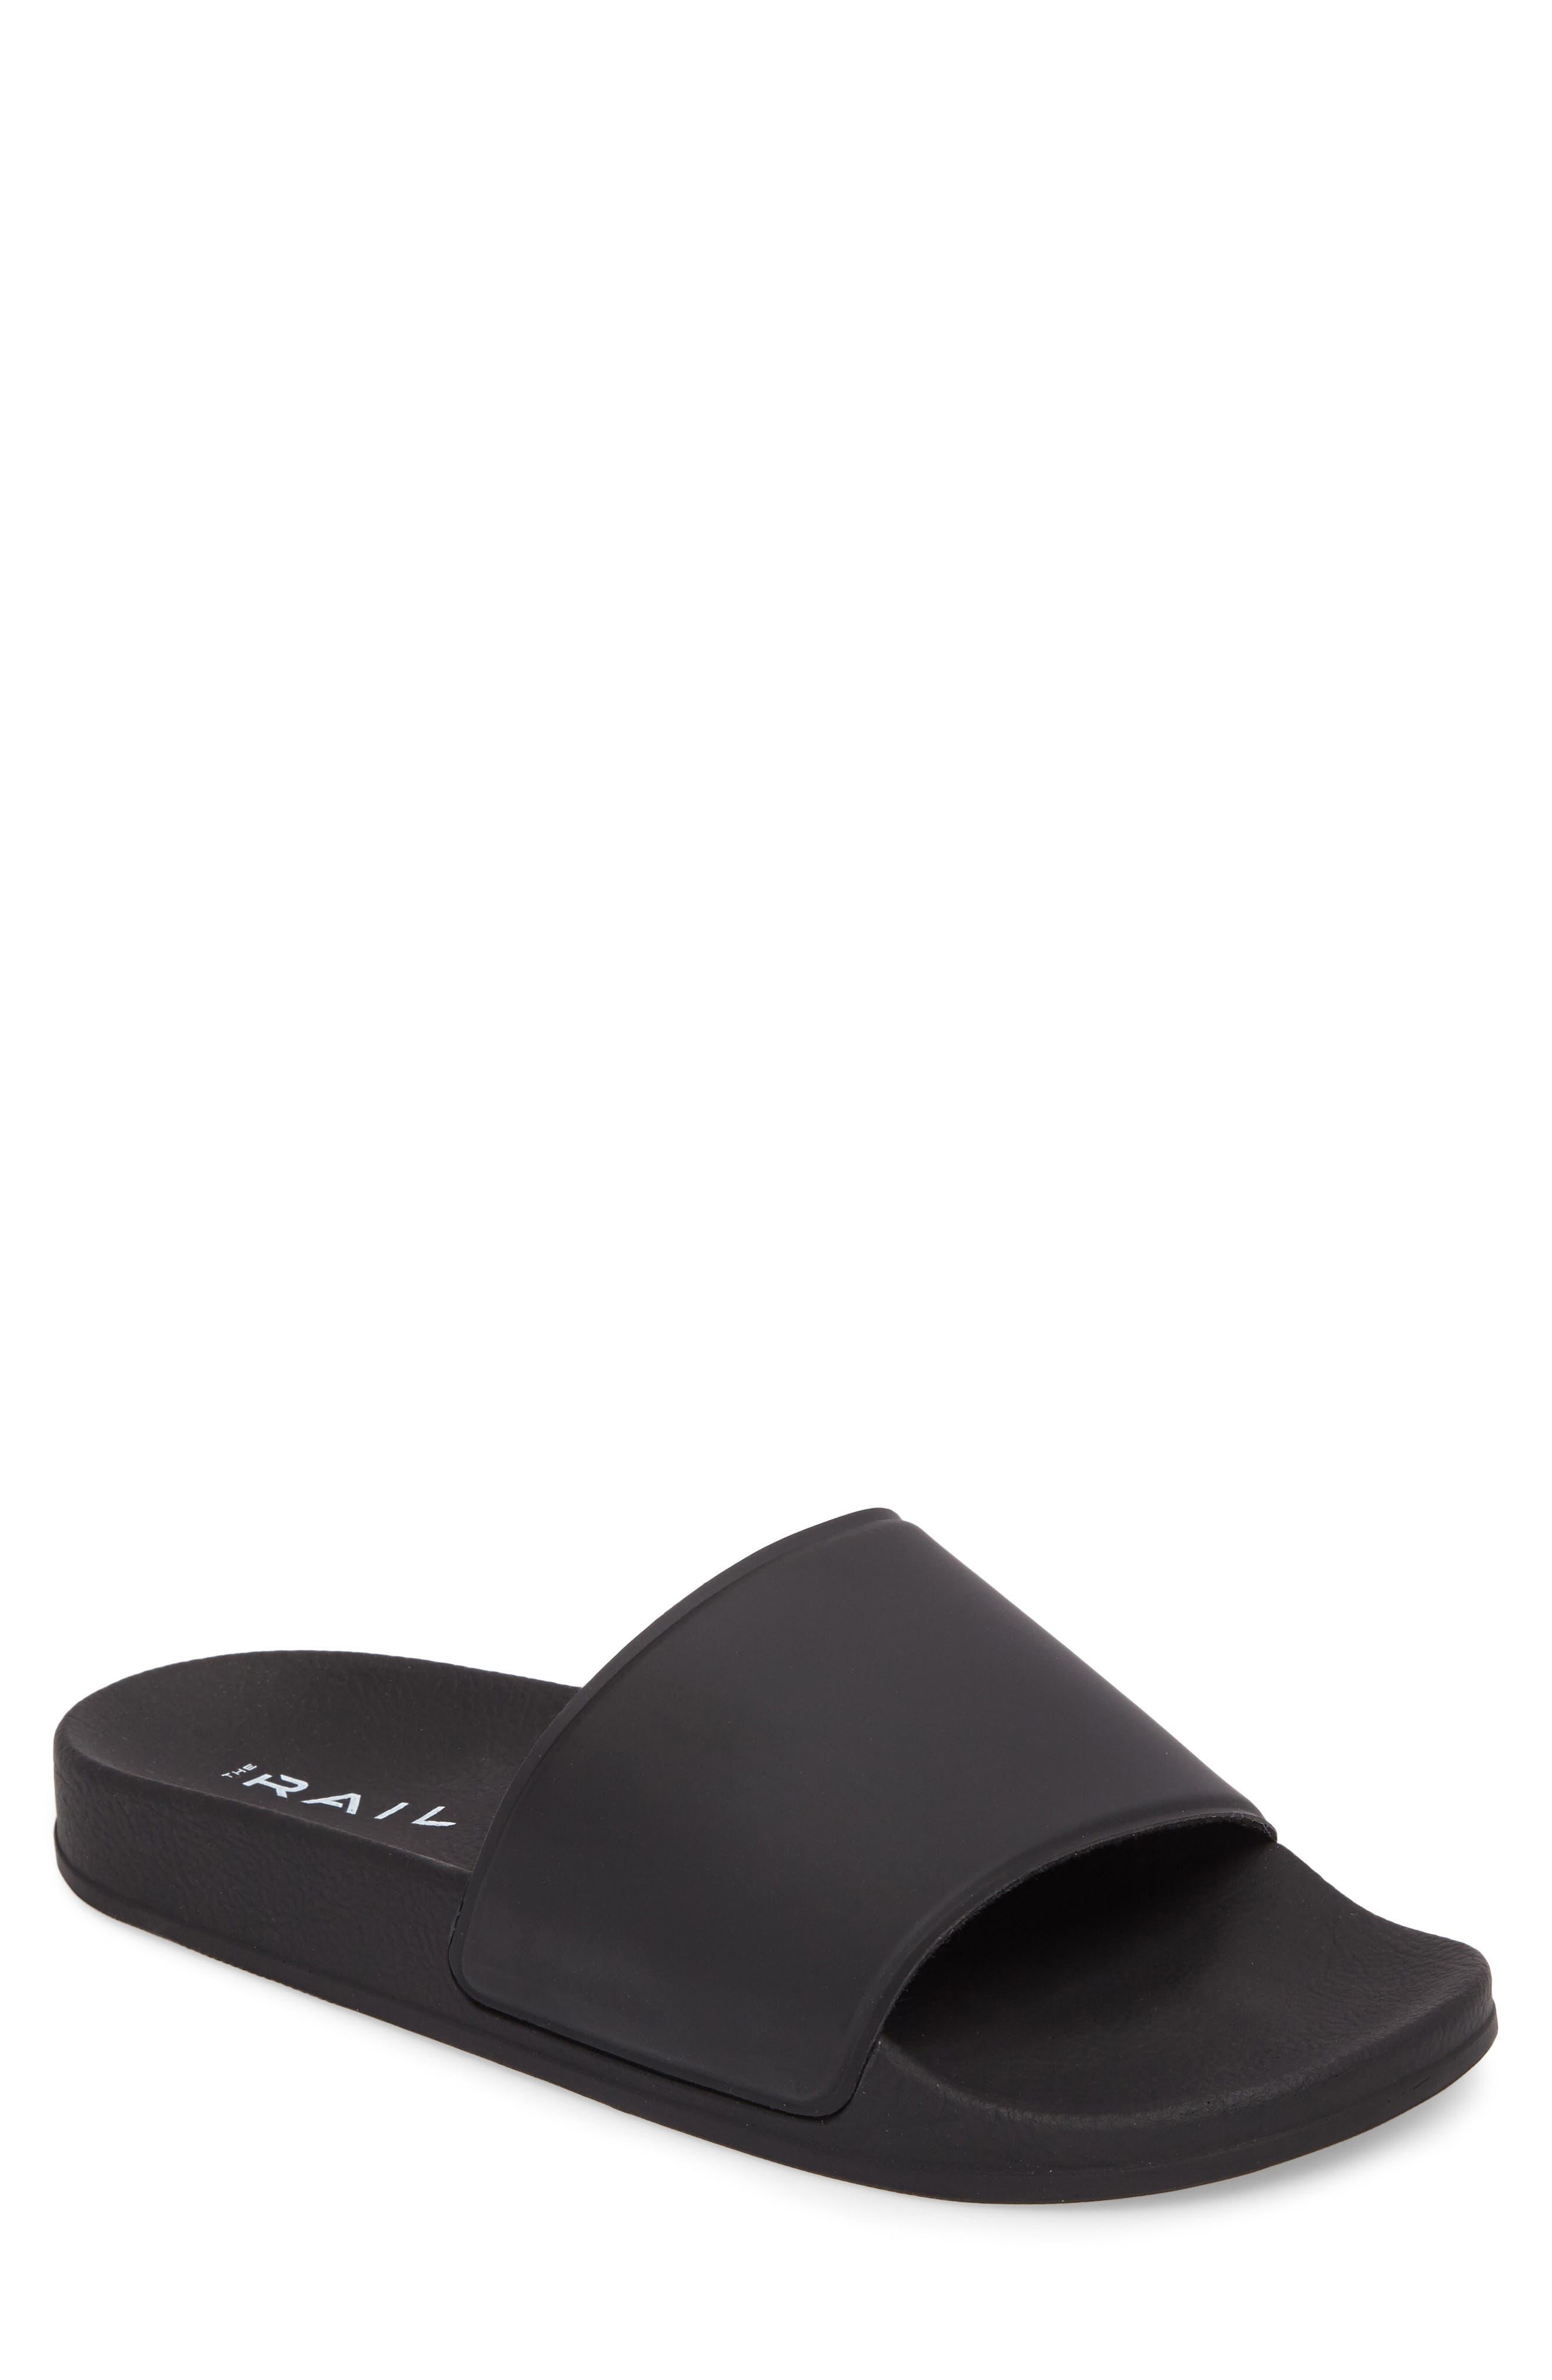 Main Image - The Rail Bondi Slide Sandal (Men)